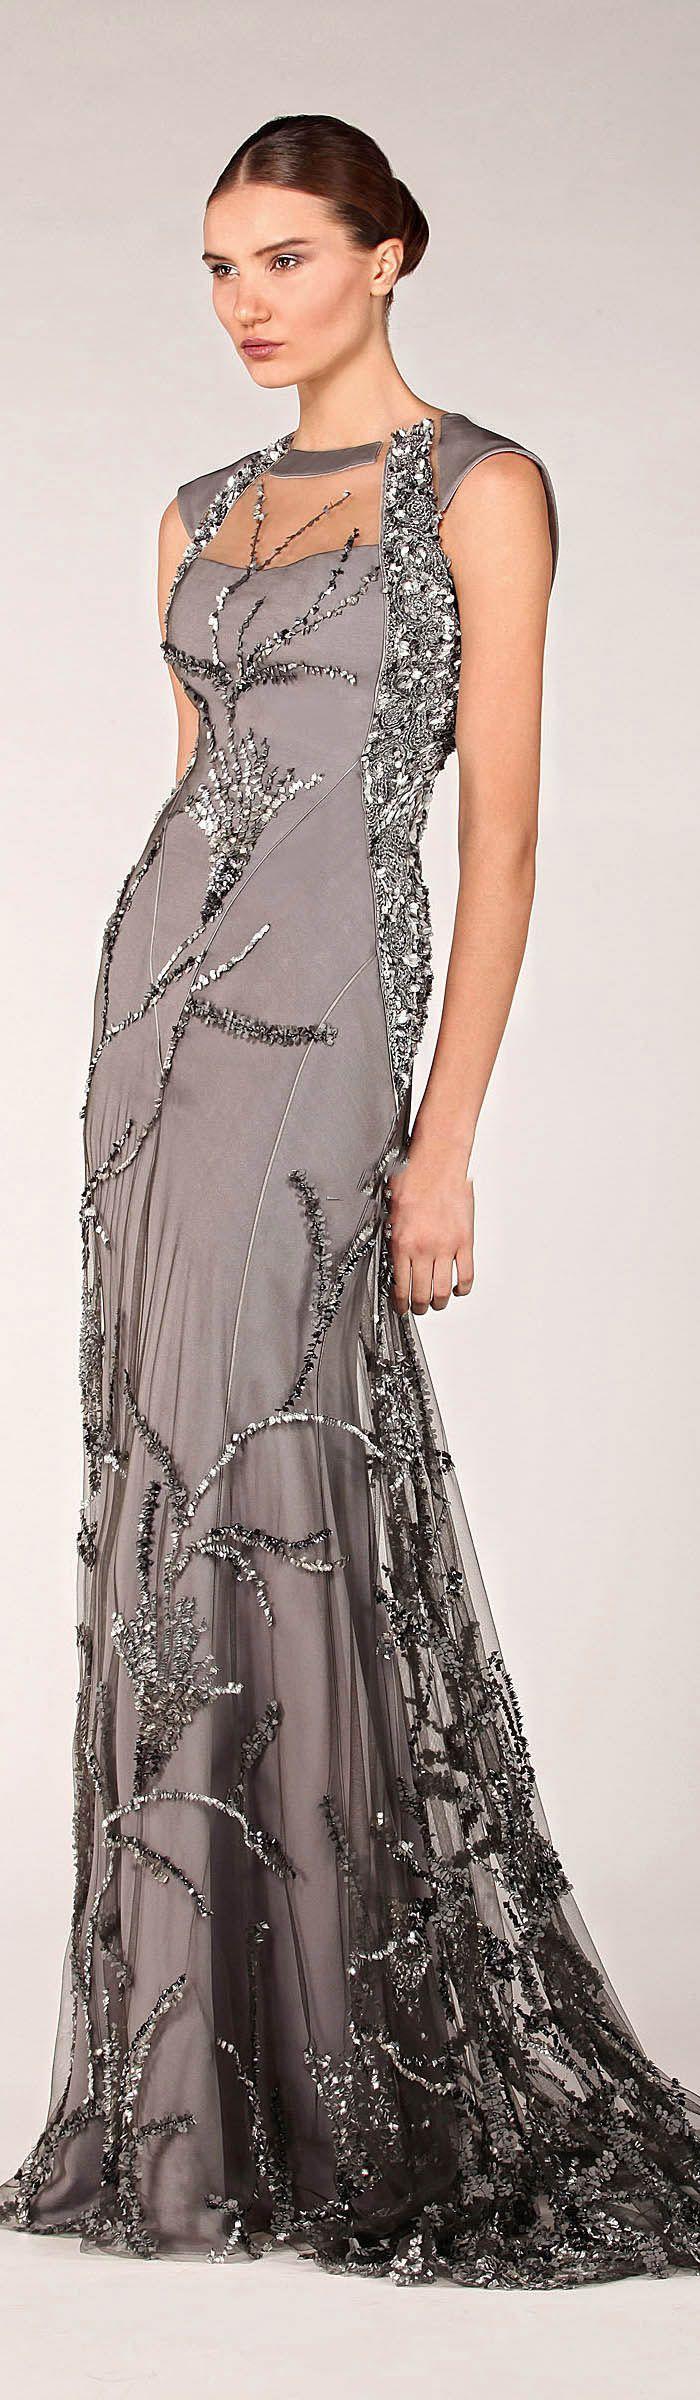 Tony Ward Fall Winter 2013 2014 Fashion Diva Design